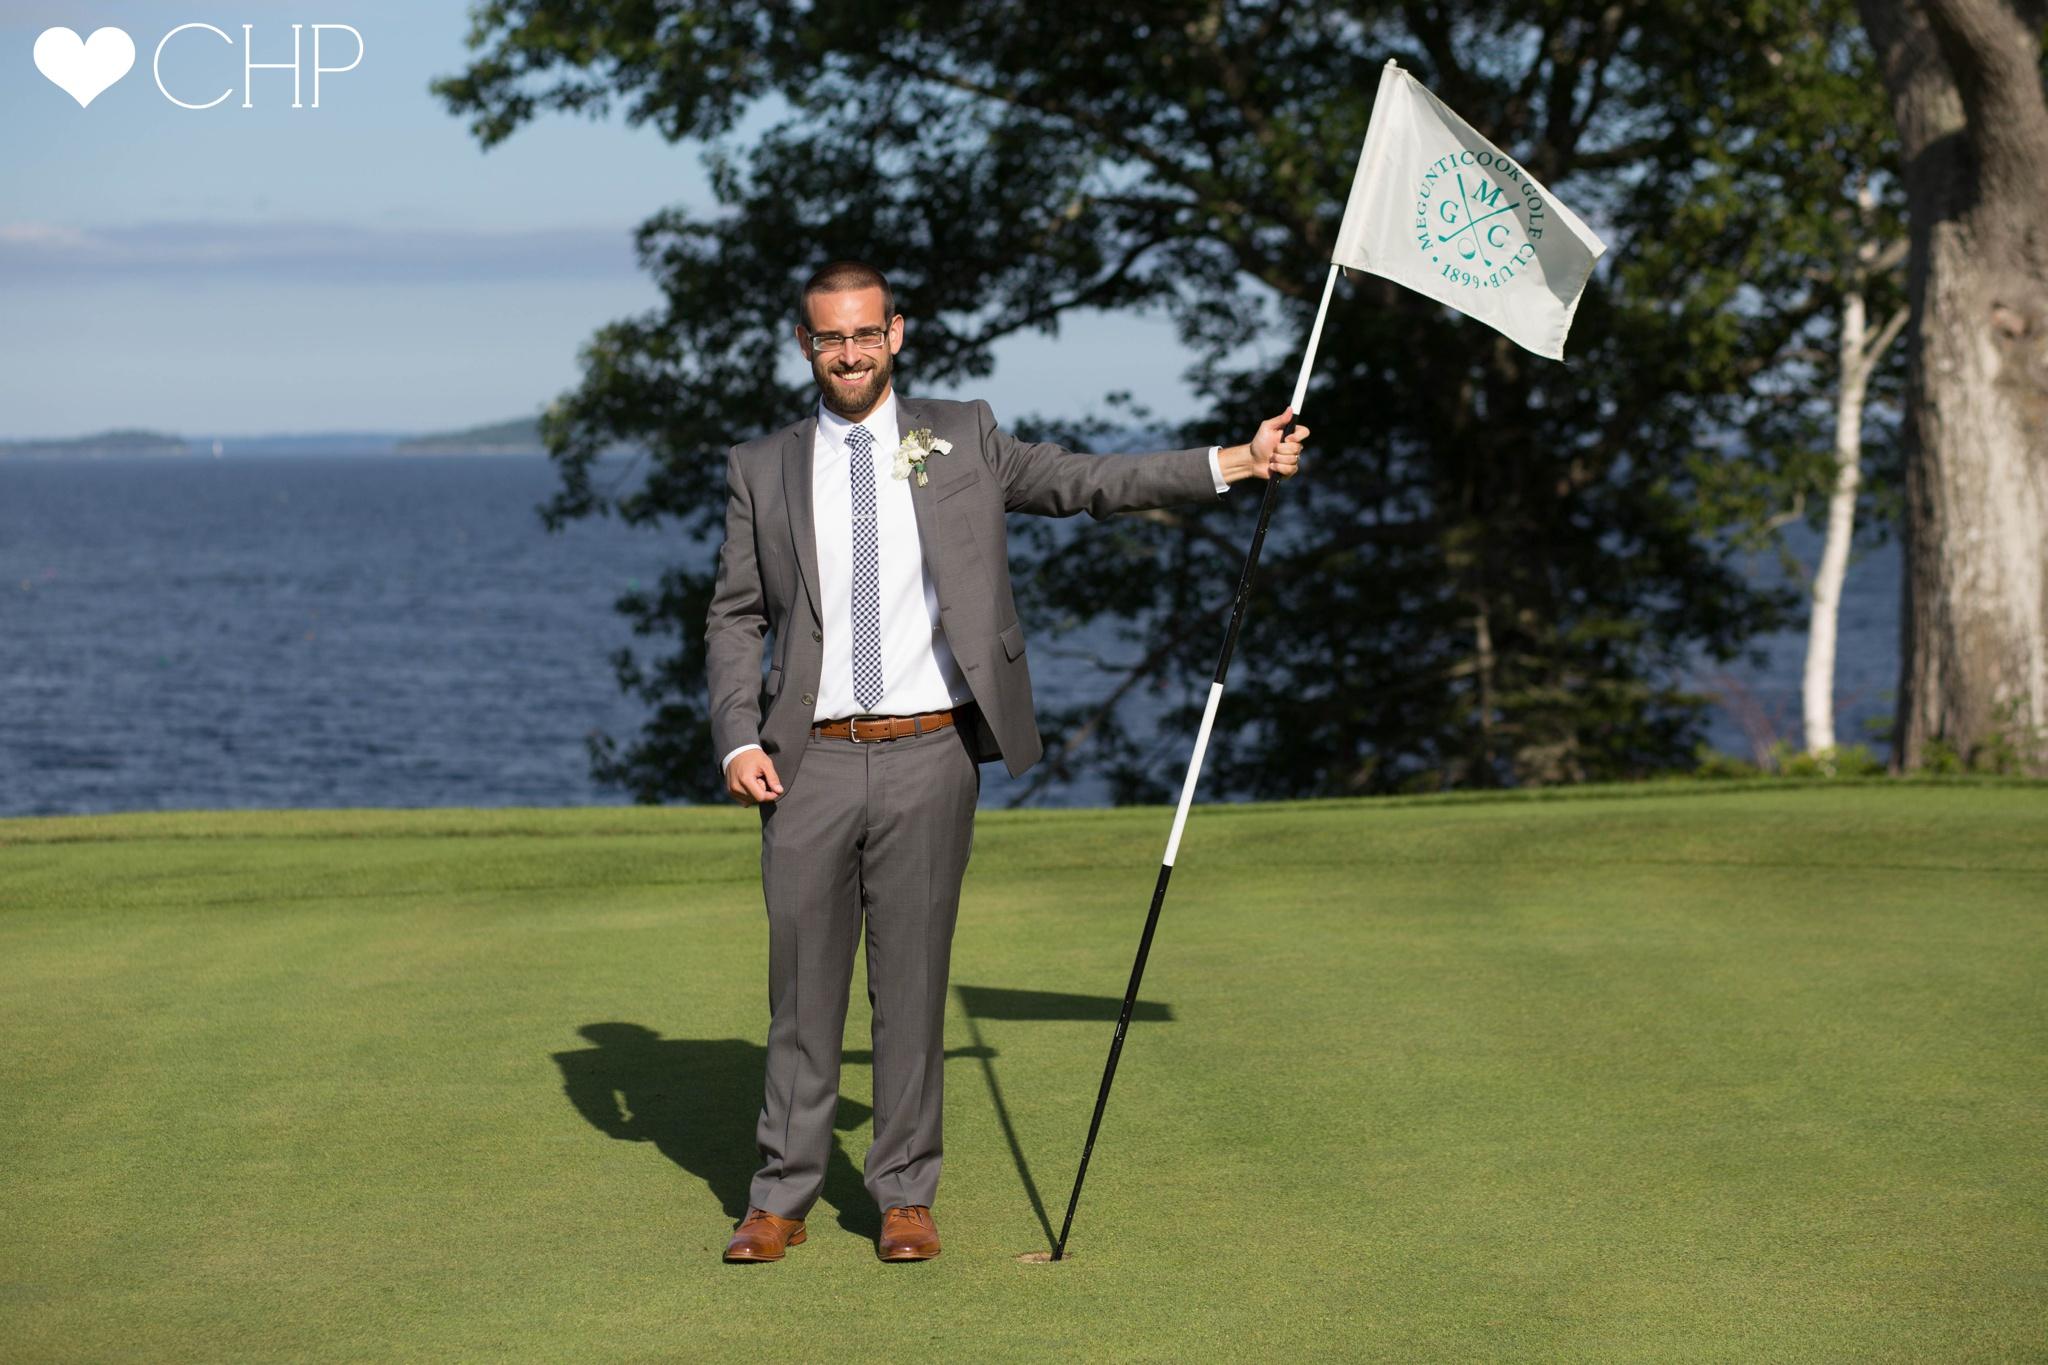 Weddings-at-the-Megunticook-Golf-Club-Rockport-Maine